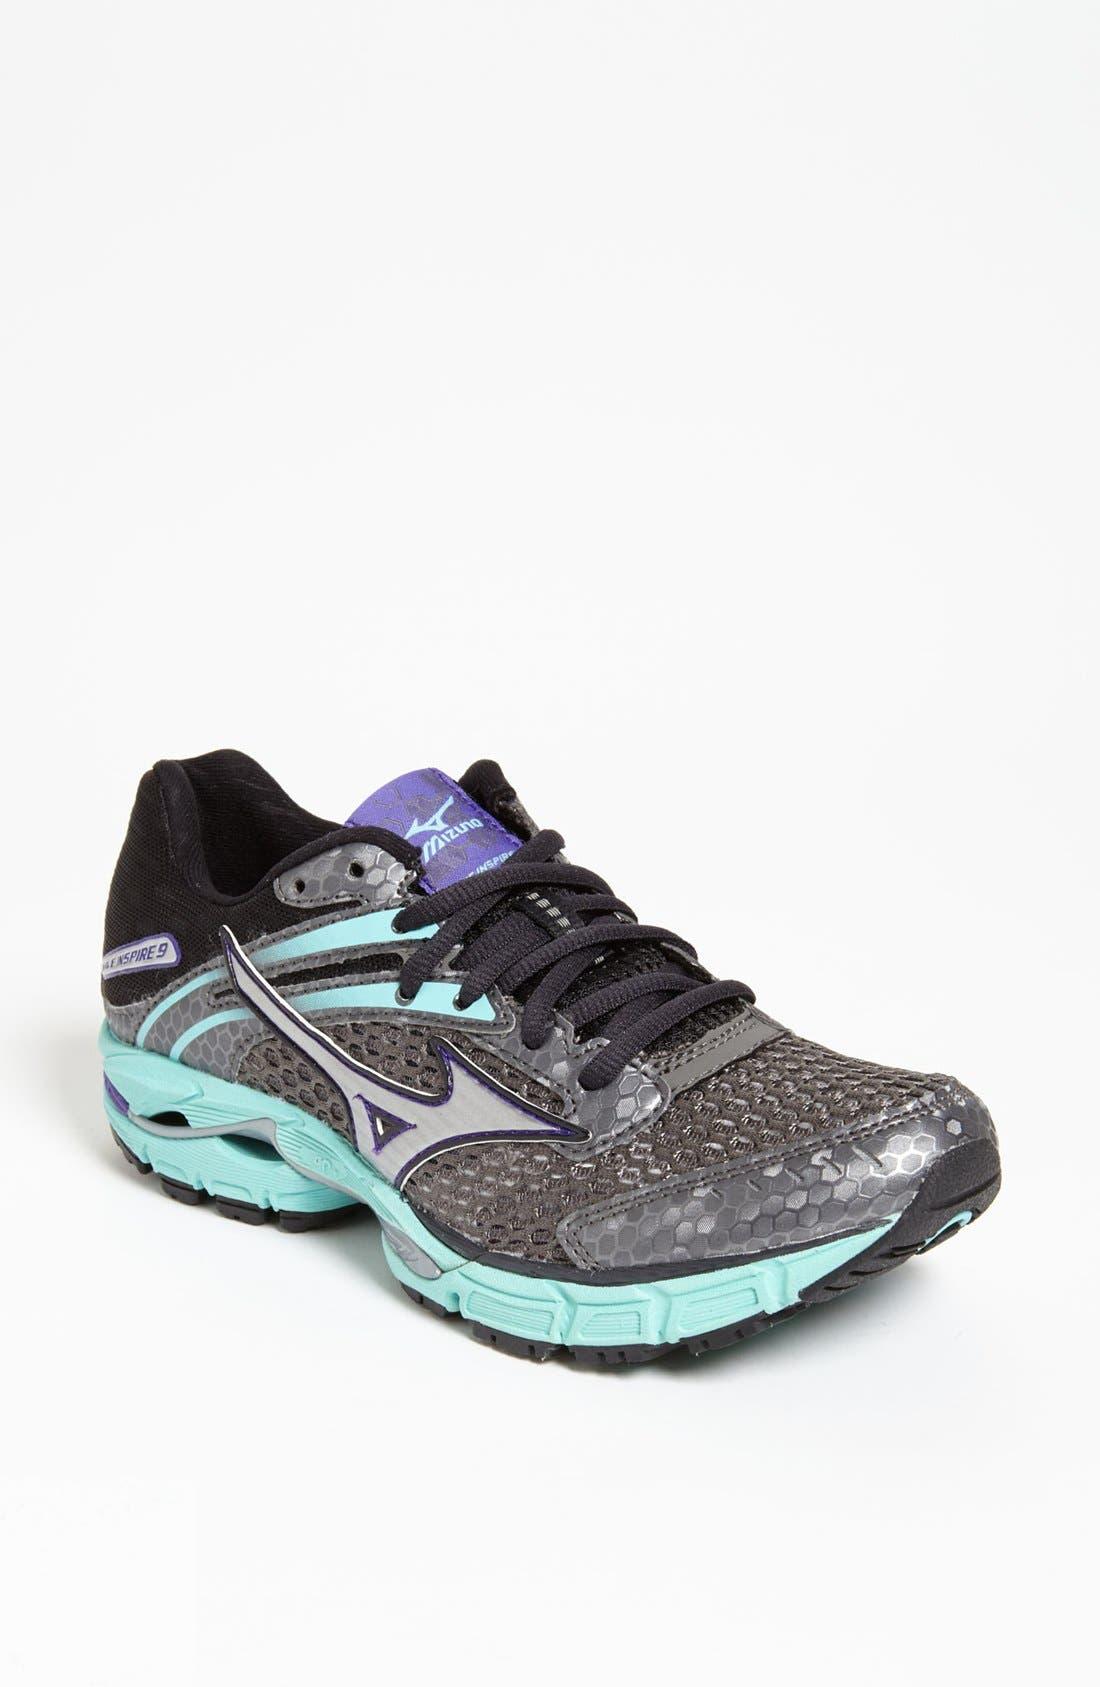 Alternate Image 1 Selected - Mizuno 'Wave Inspire 9' Running Shoe (Women)